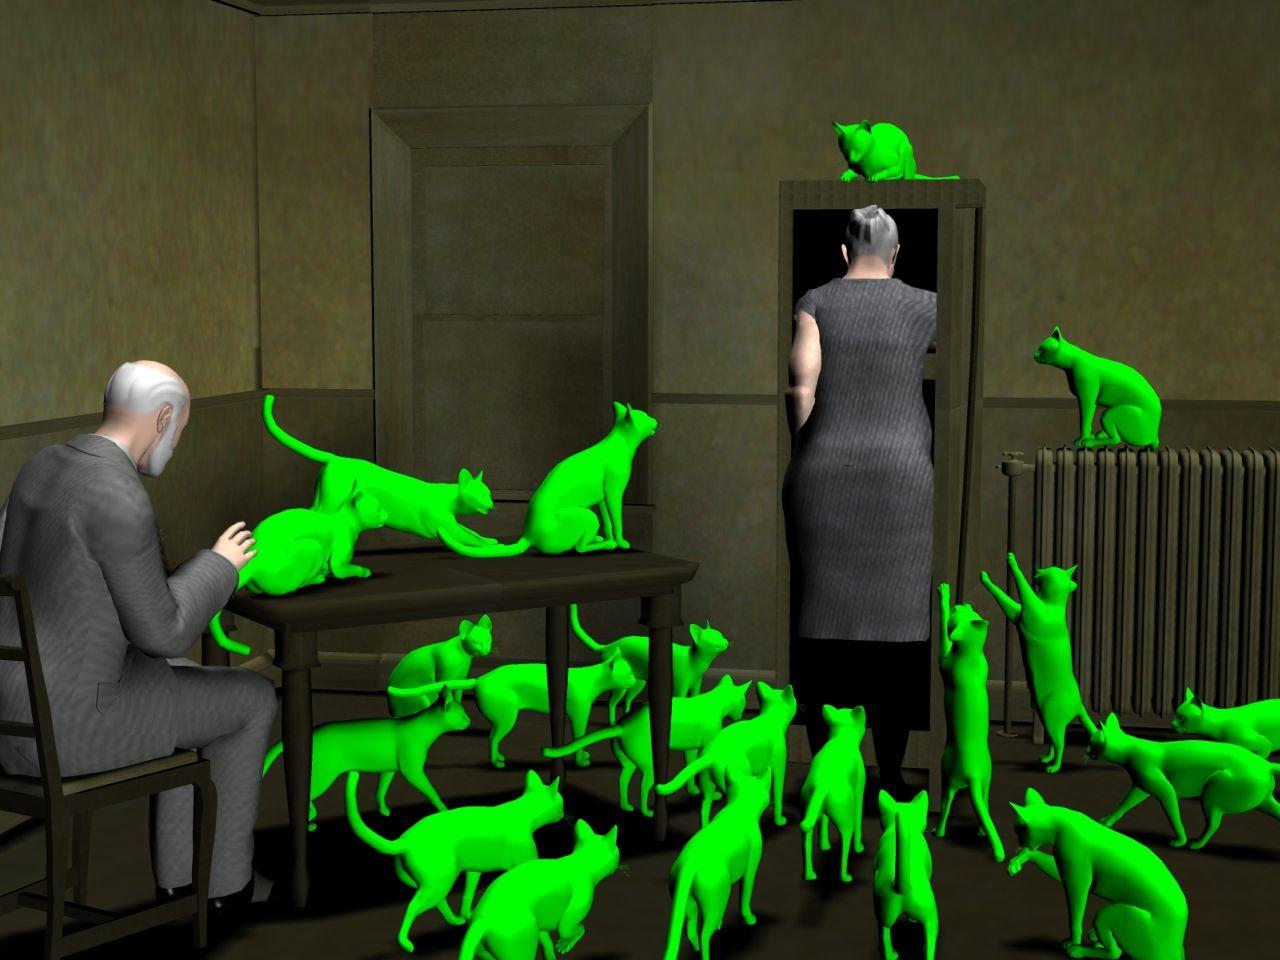 Computer Generated copy of Radioactive Cats (EnglishBob on Deviant Art)